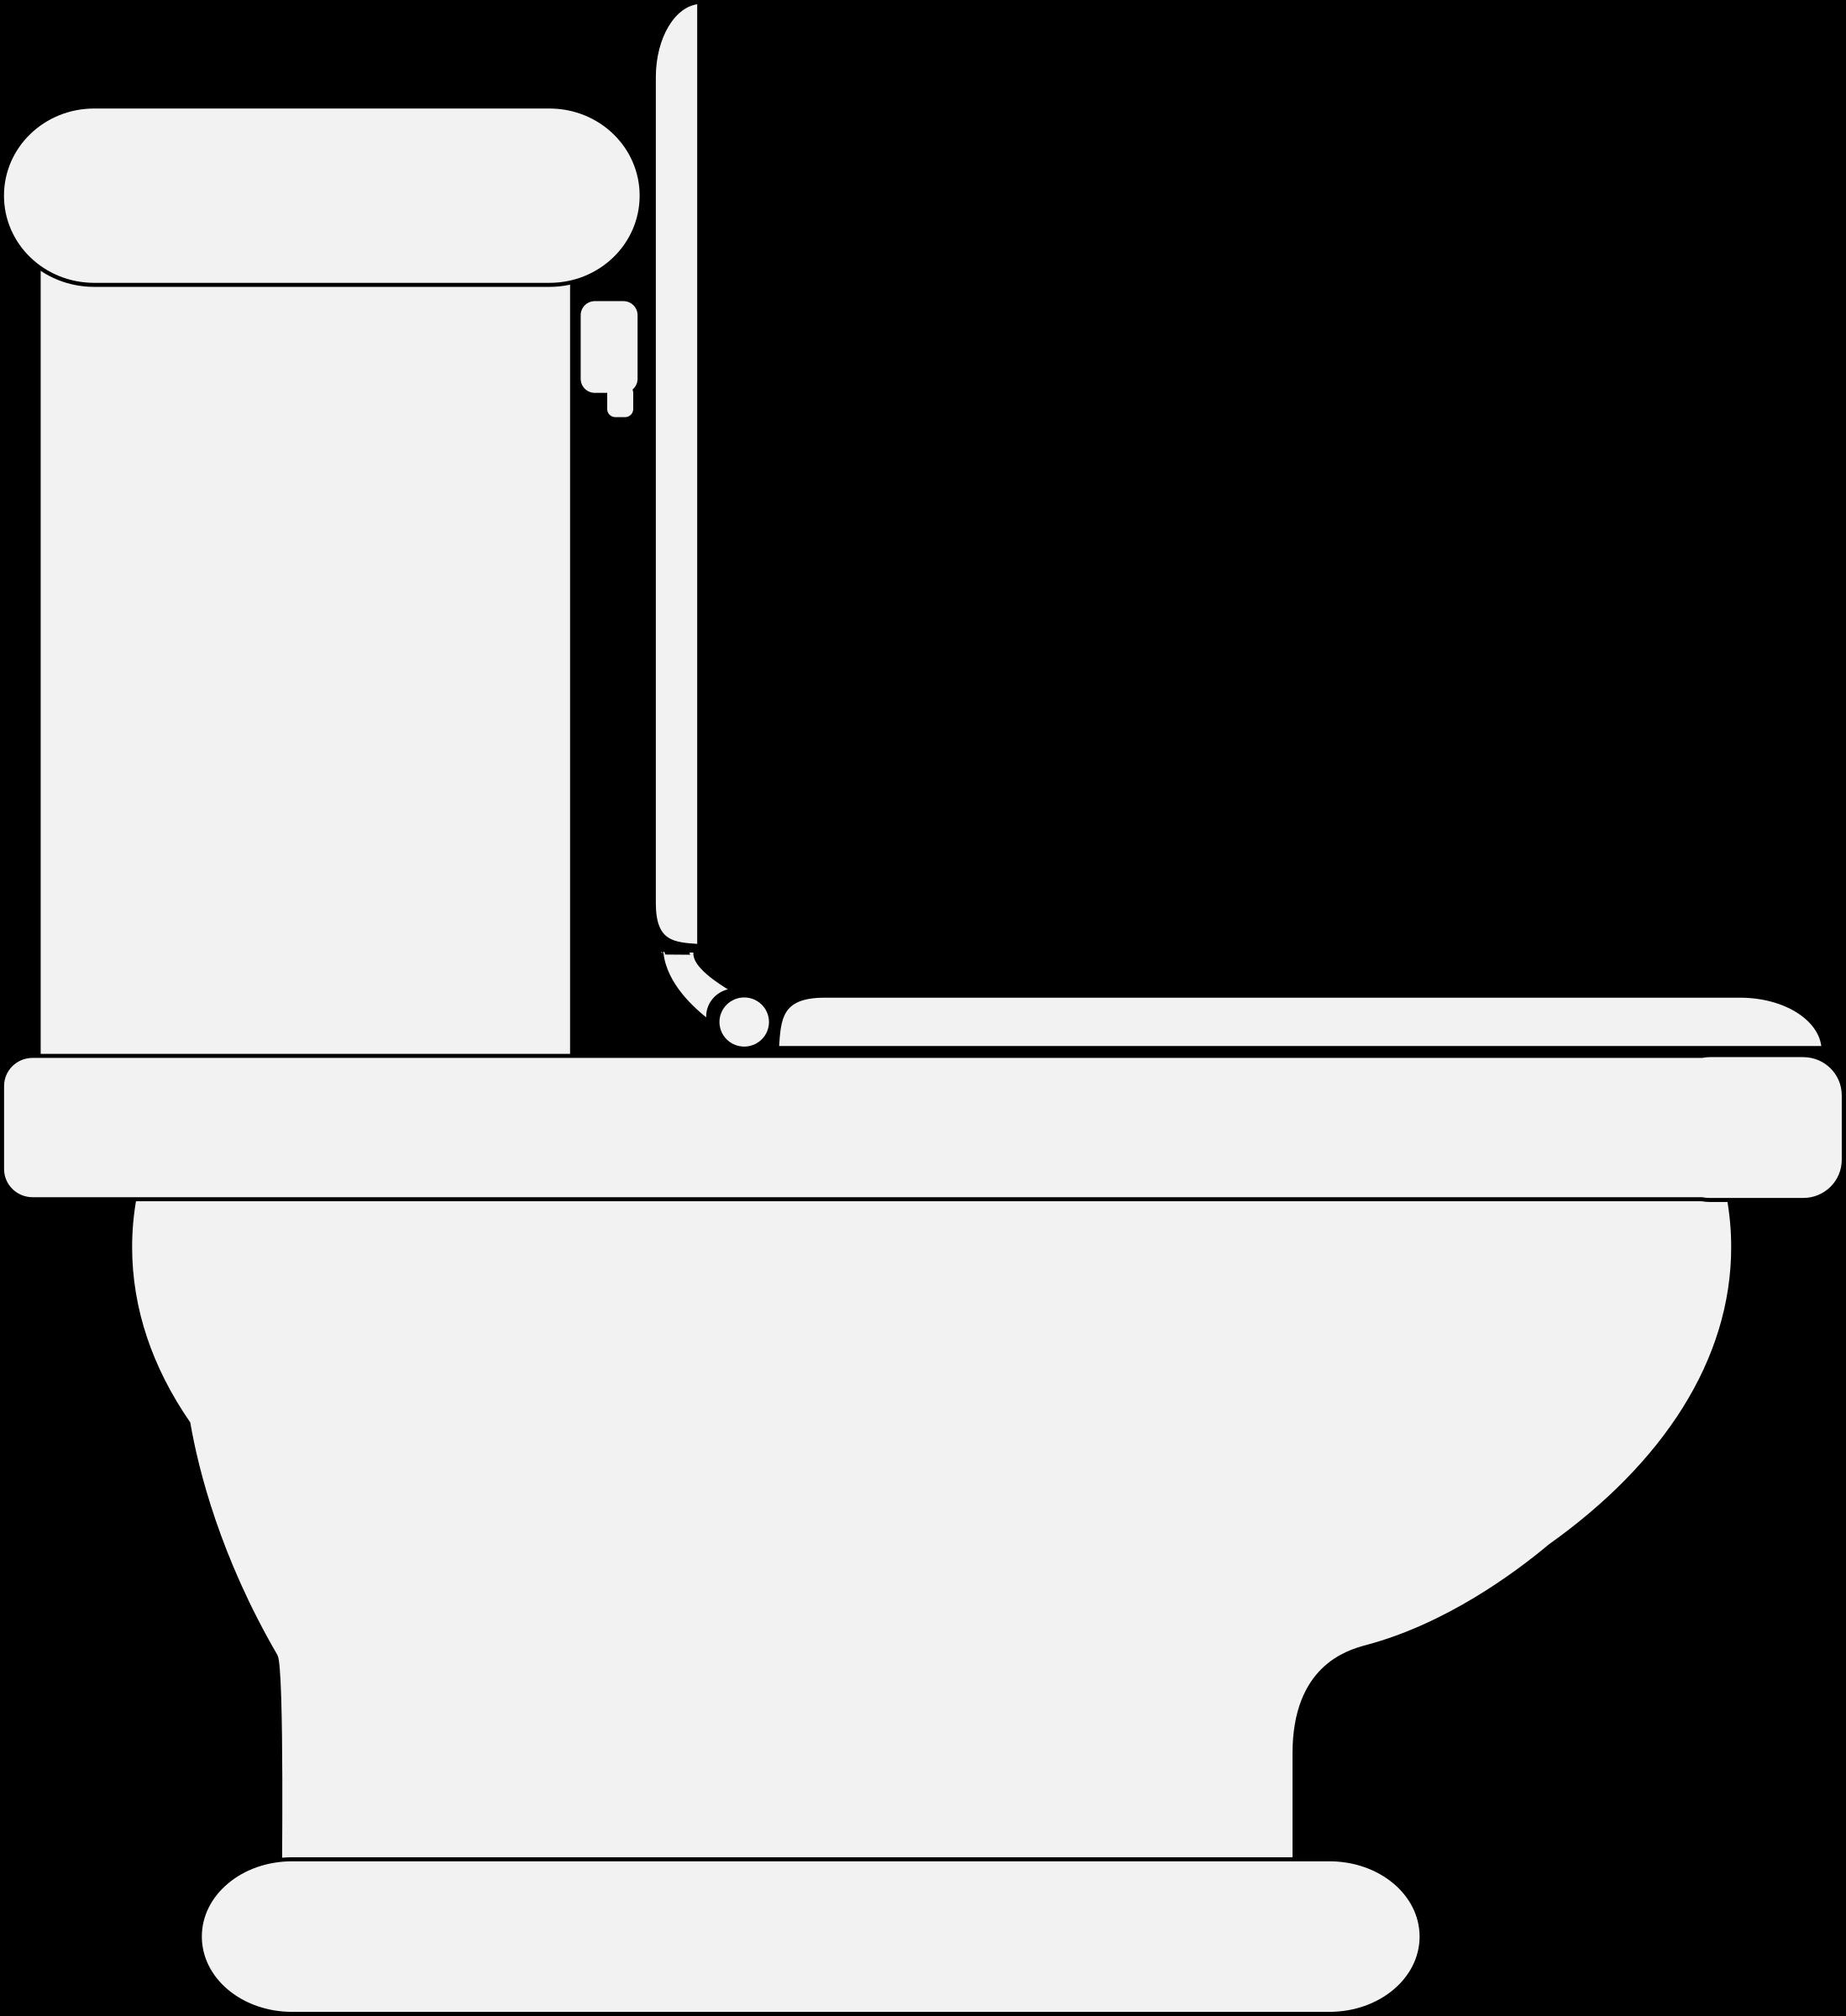 Clipart Toilet Seat Open